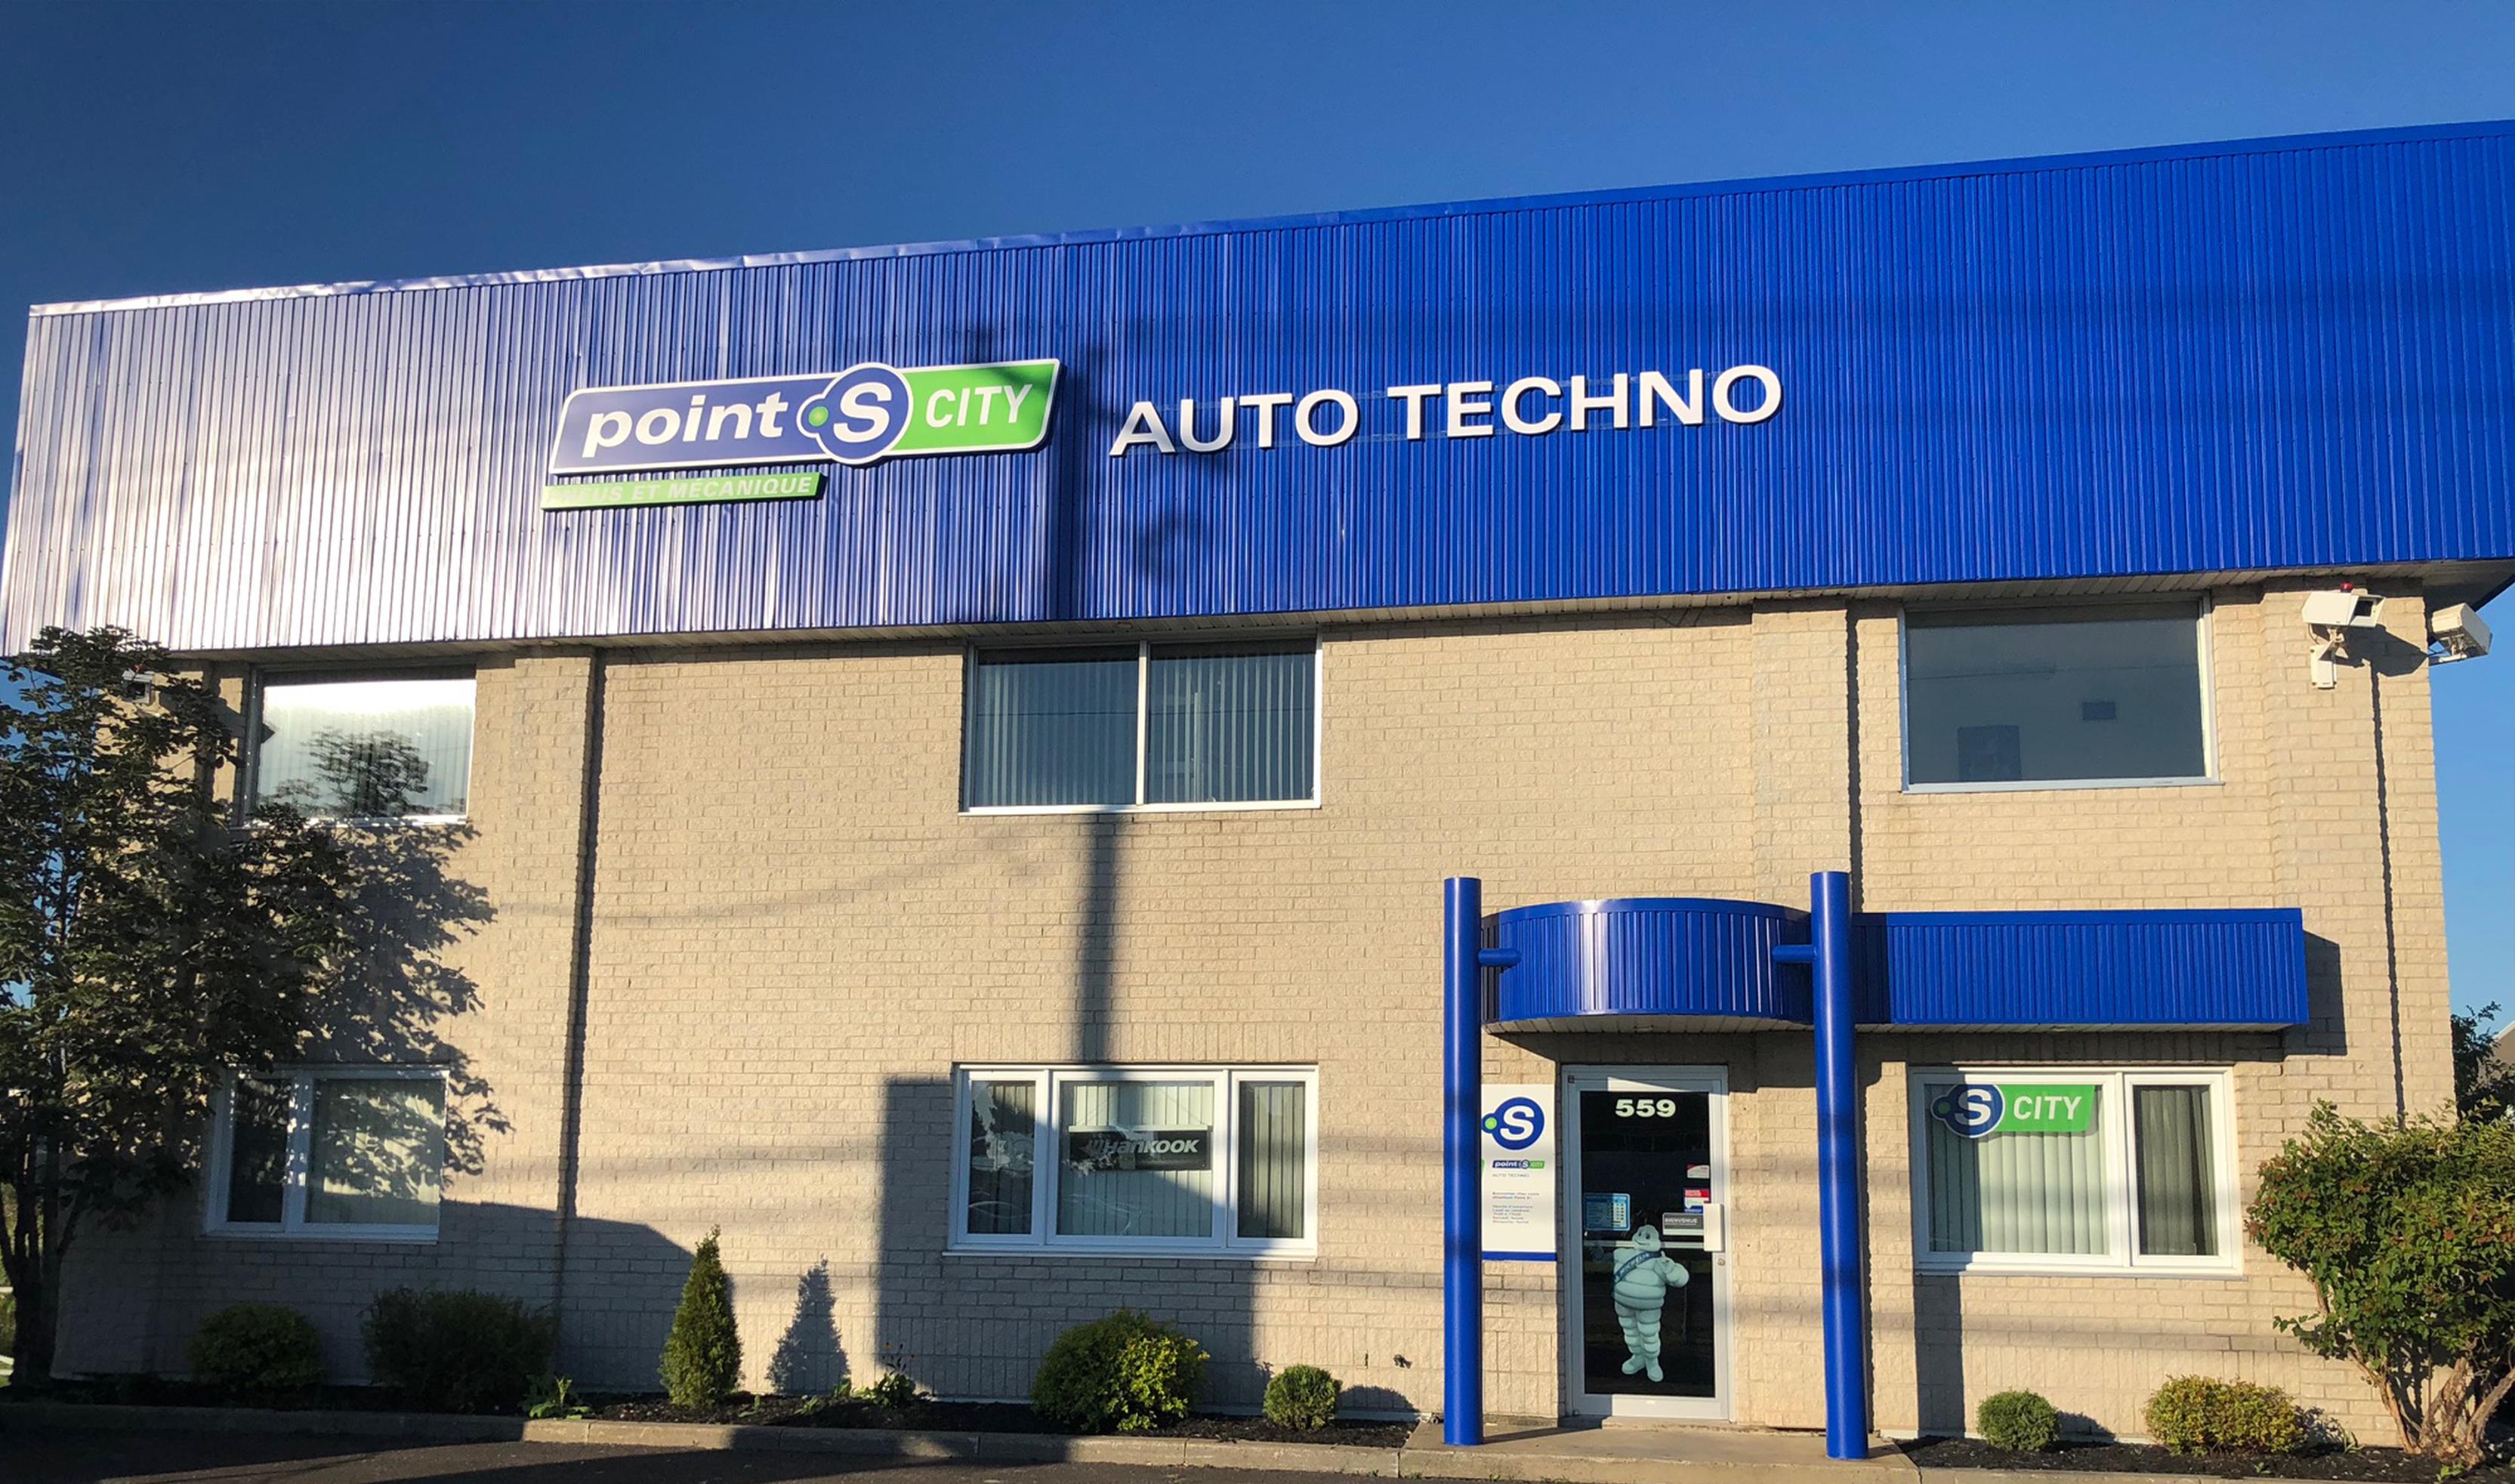 Mécanique Auto-Techno Inc.